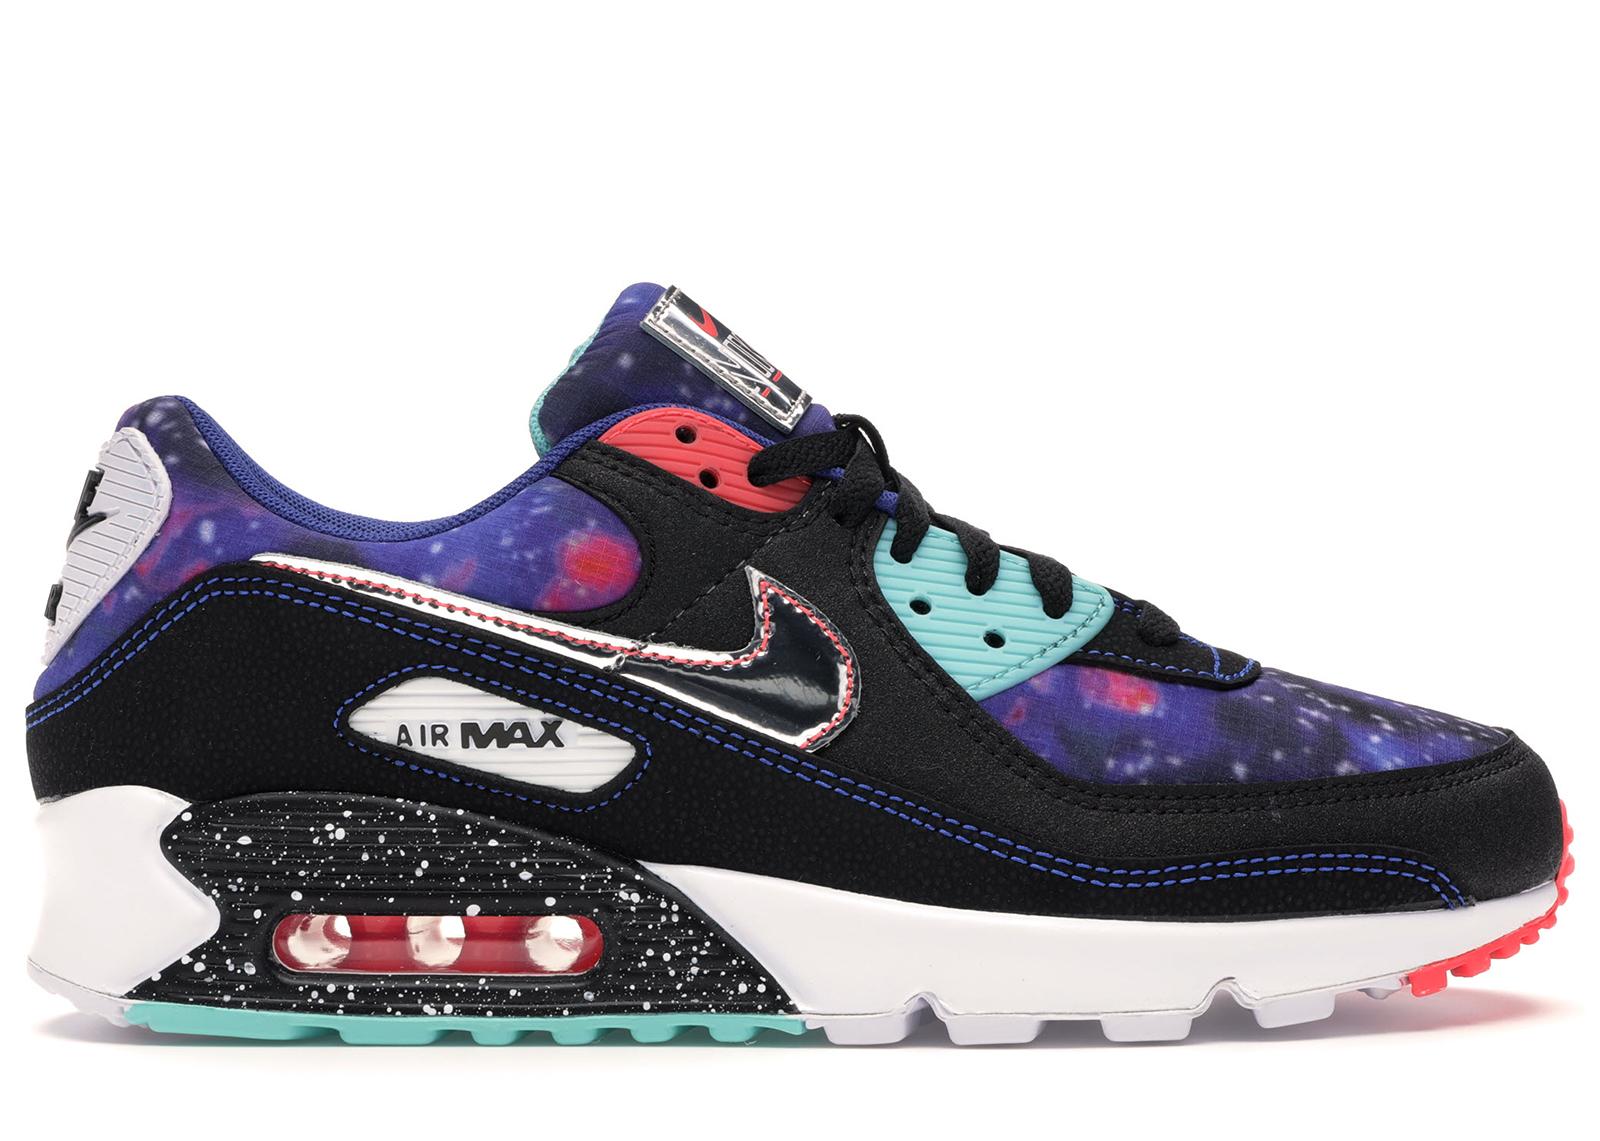 Nike Air Max 90 Supernova (2020)